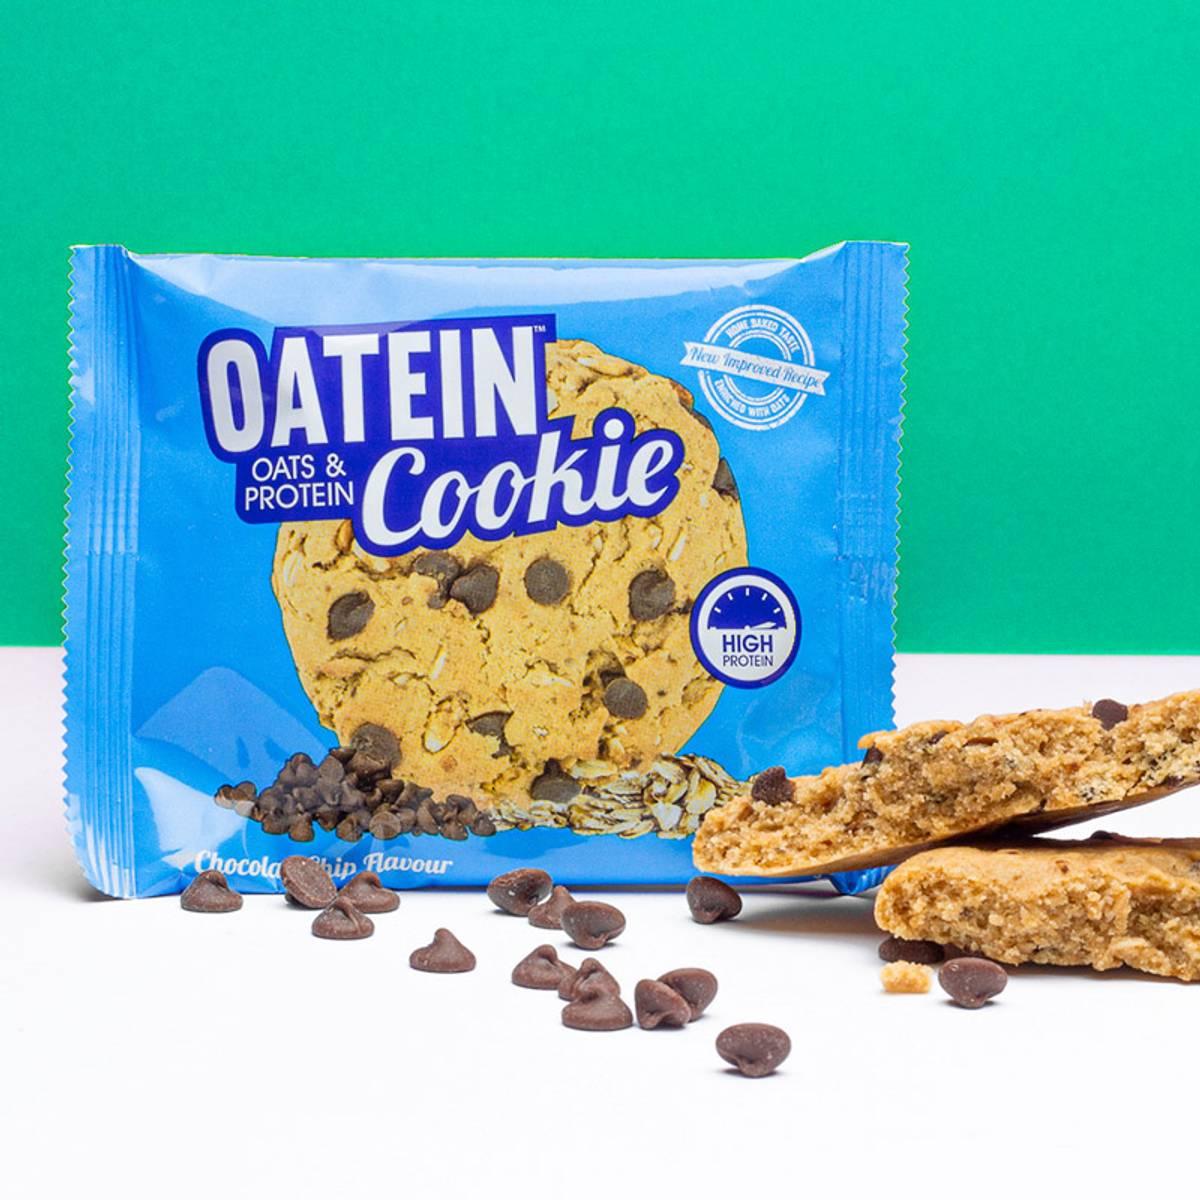 Oatein - White Chocolate Celebration Protein Cookie 75g